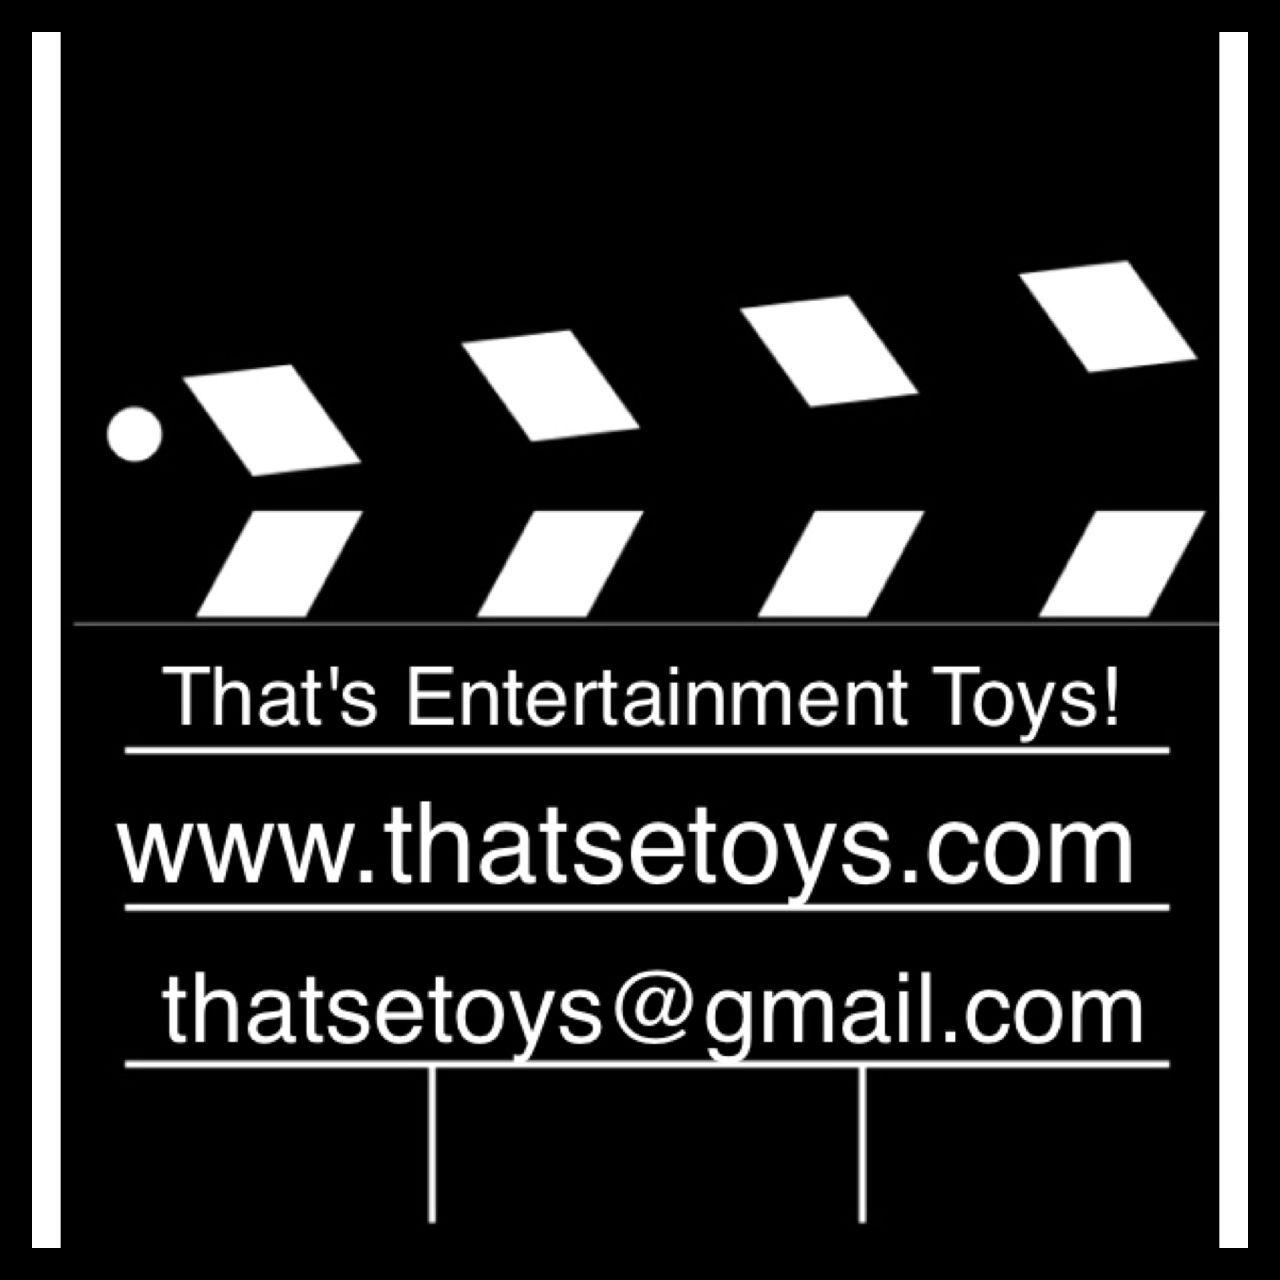 That's Entertainment Toys & Comics!